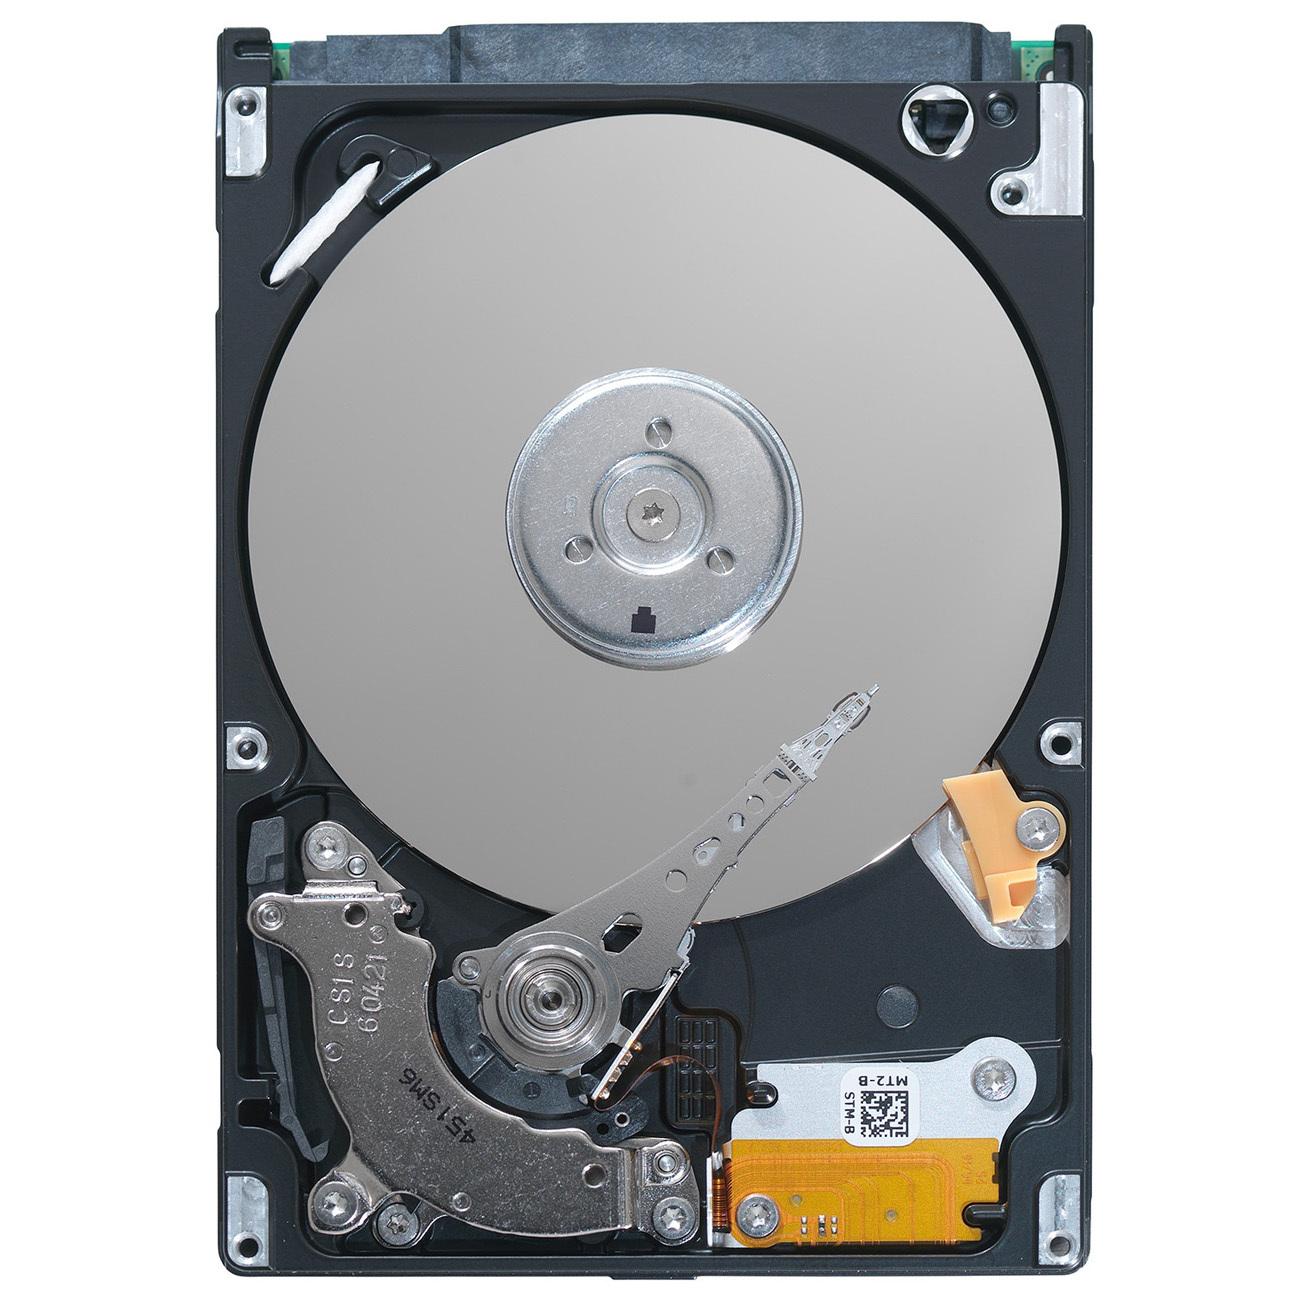 160GB Seagate Momentus SATA 7200RPM 16MB 2.5 Internal Hard Drive ST9160412AS